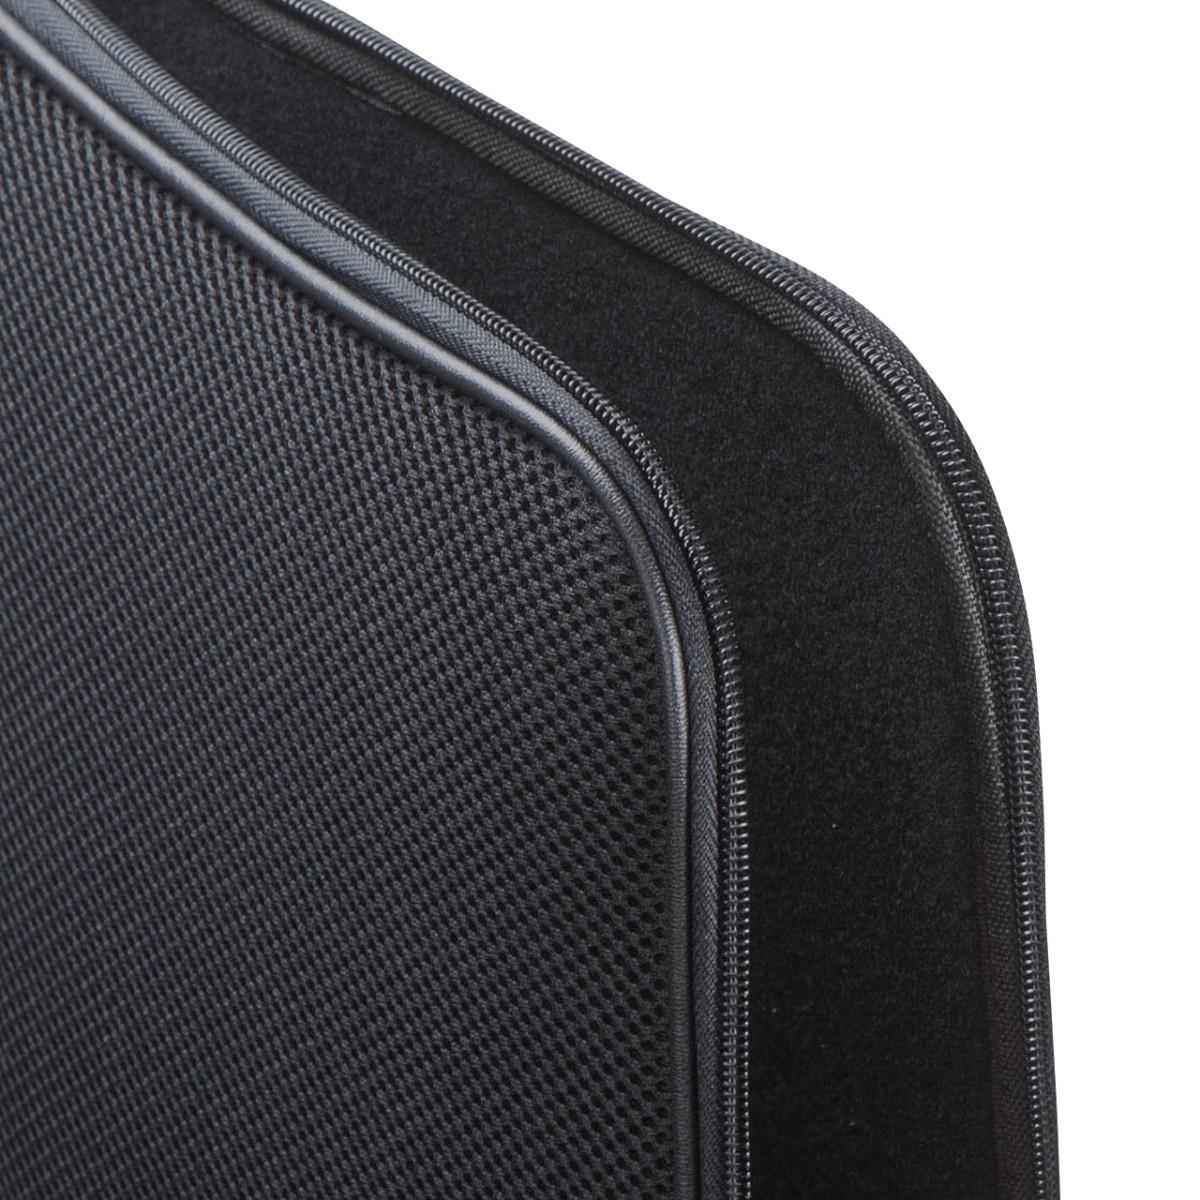 [IN-SG14BK] 【代引き不可】低反発3Dメッシュケース(14.1インチ対応・ブラック)